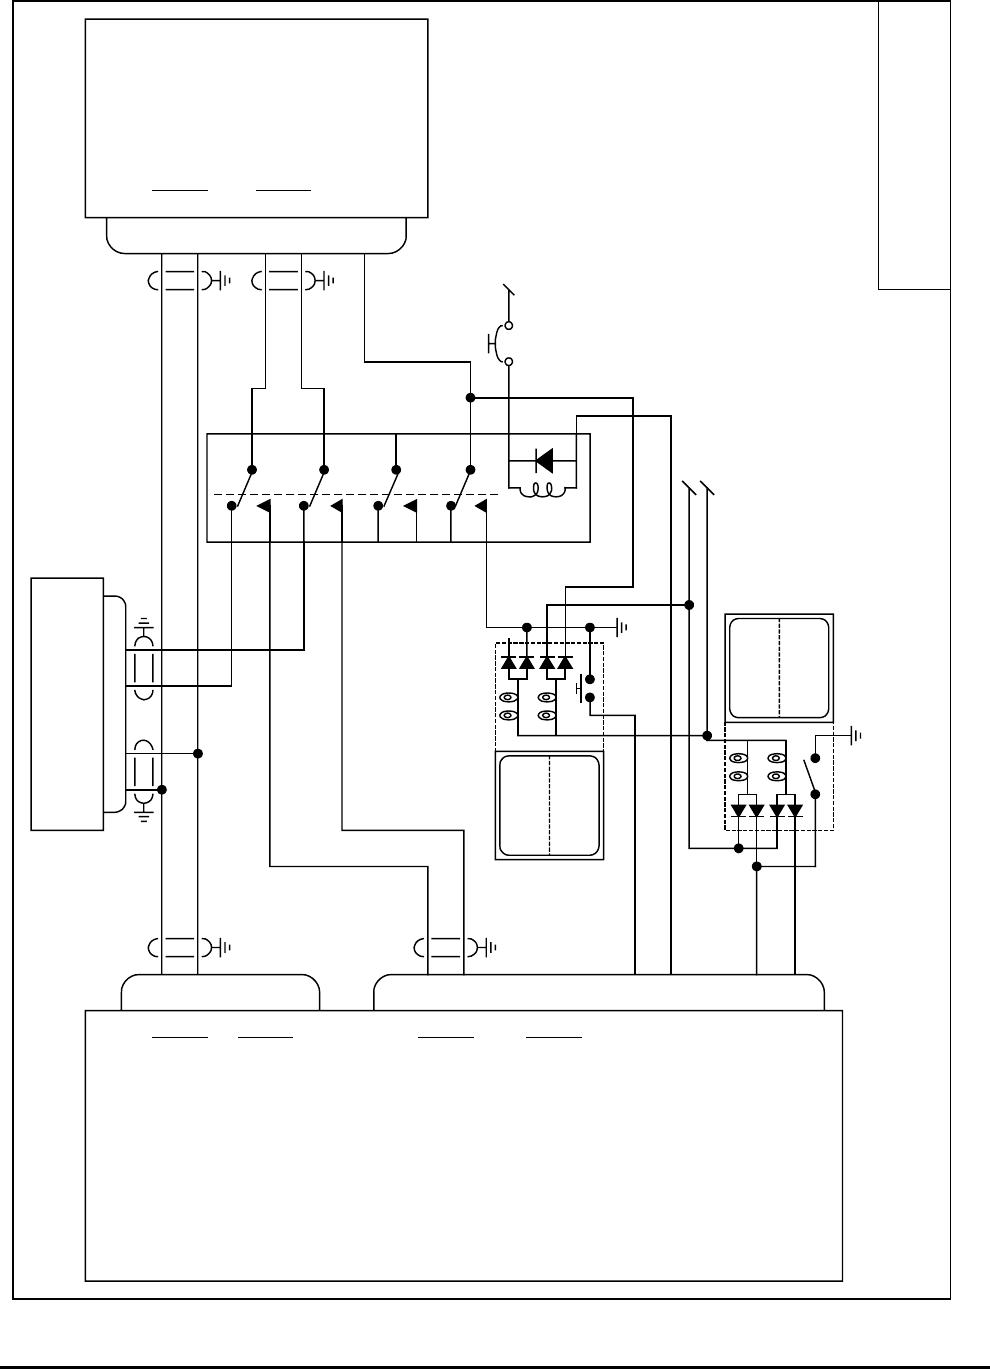 Honeywell MK VI, MK VIII Integrated Primus 440/660/880